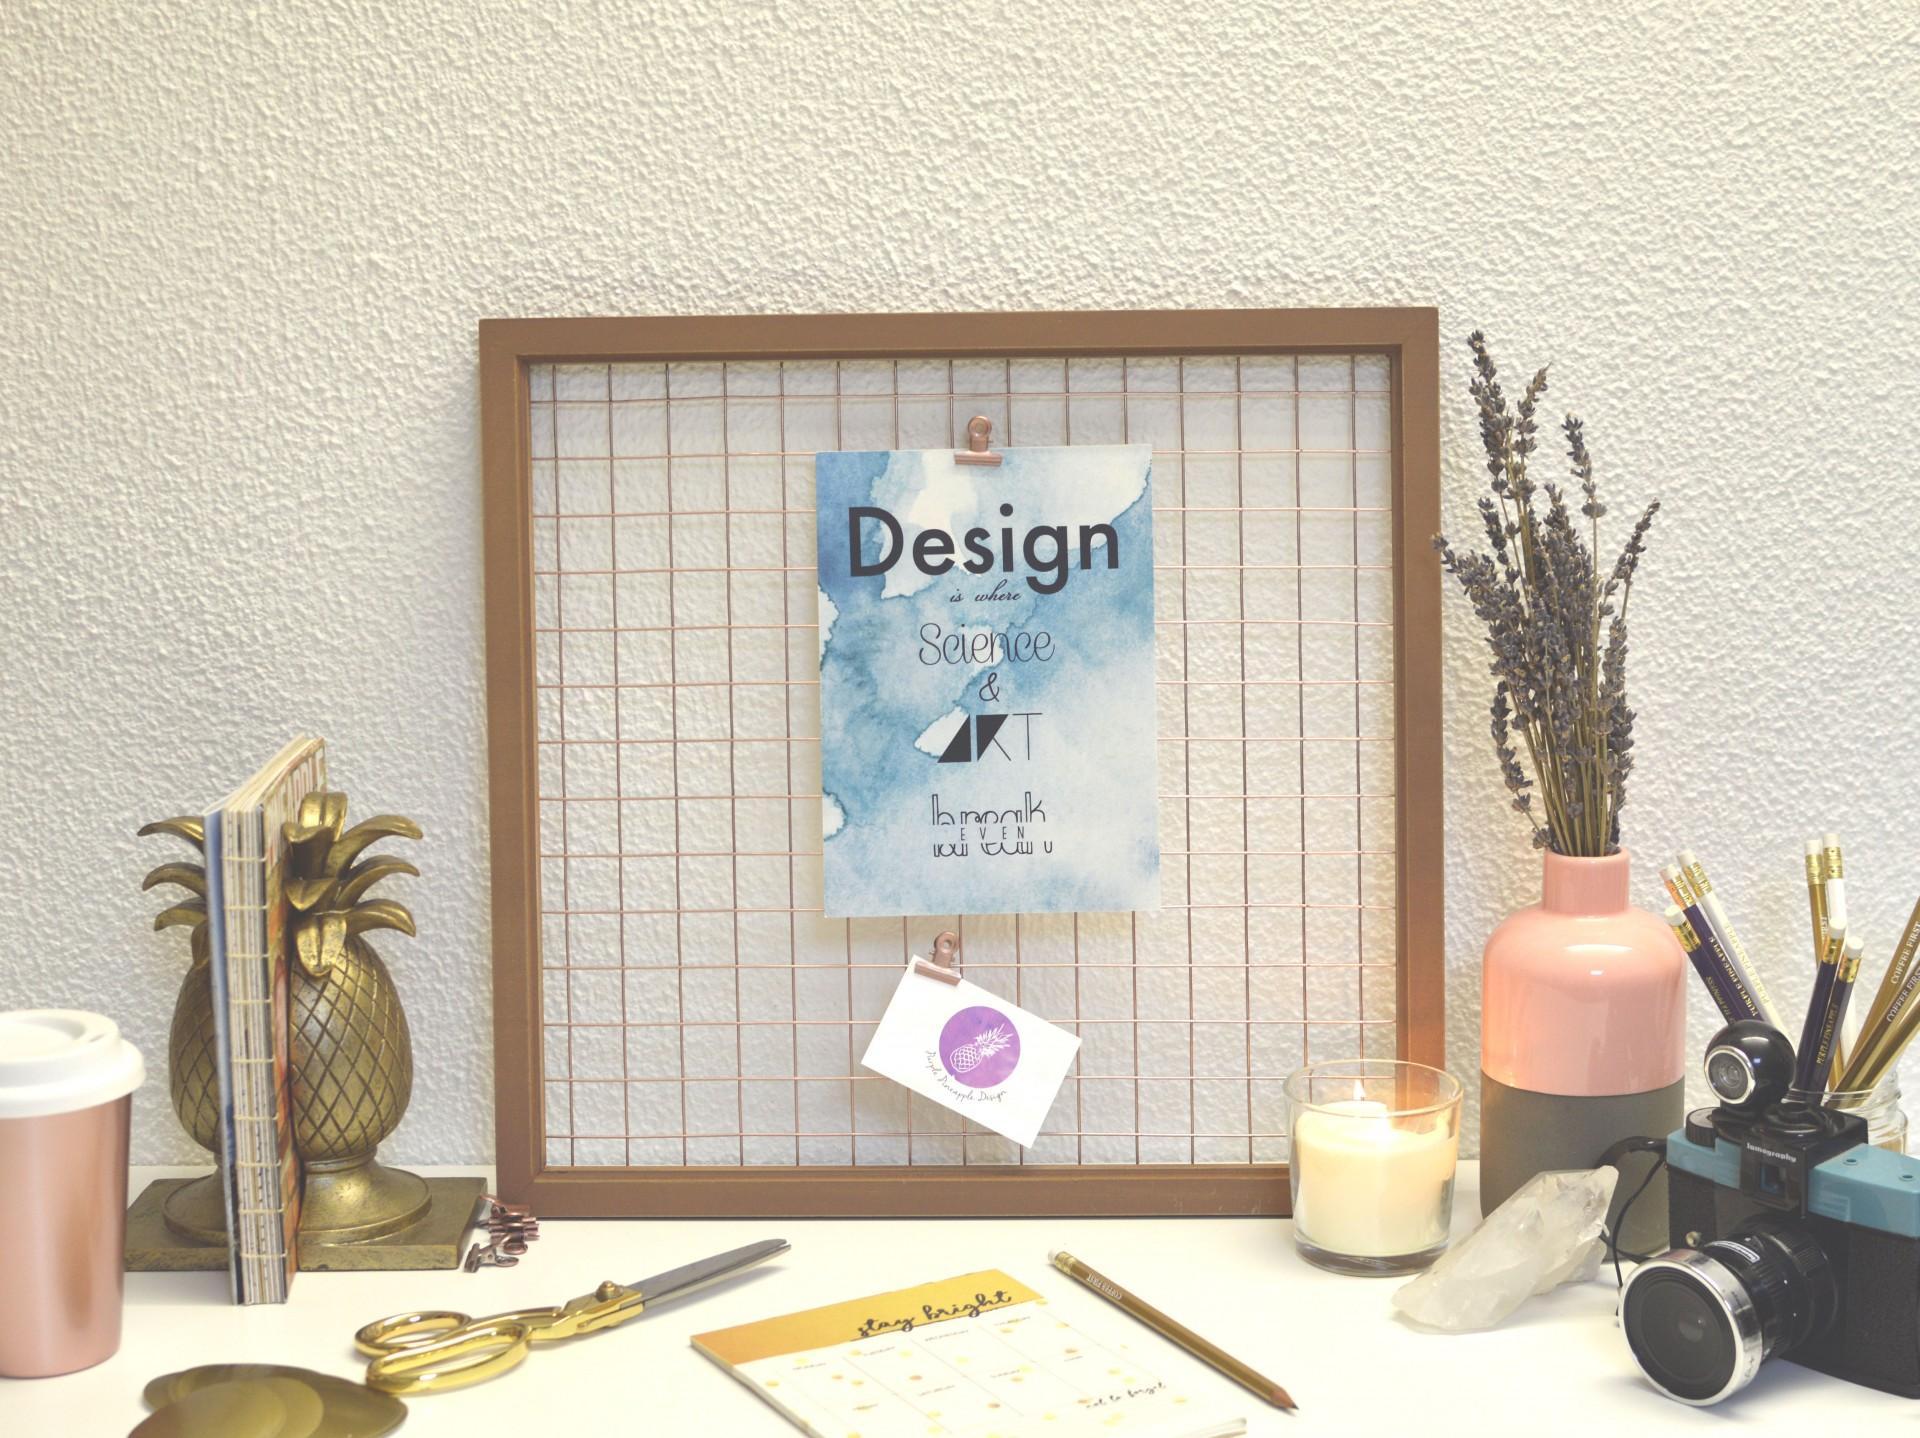 Design is where Science & Art break even